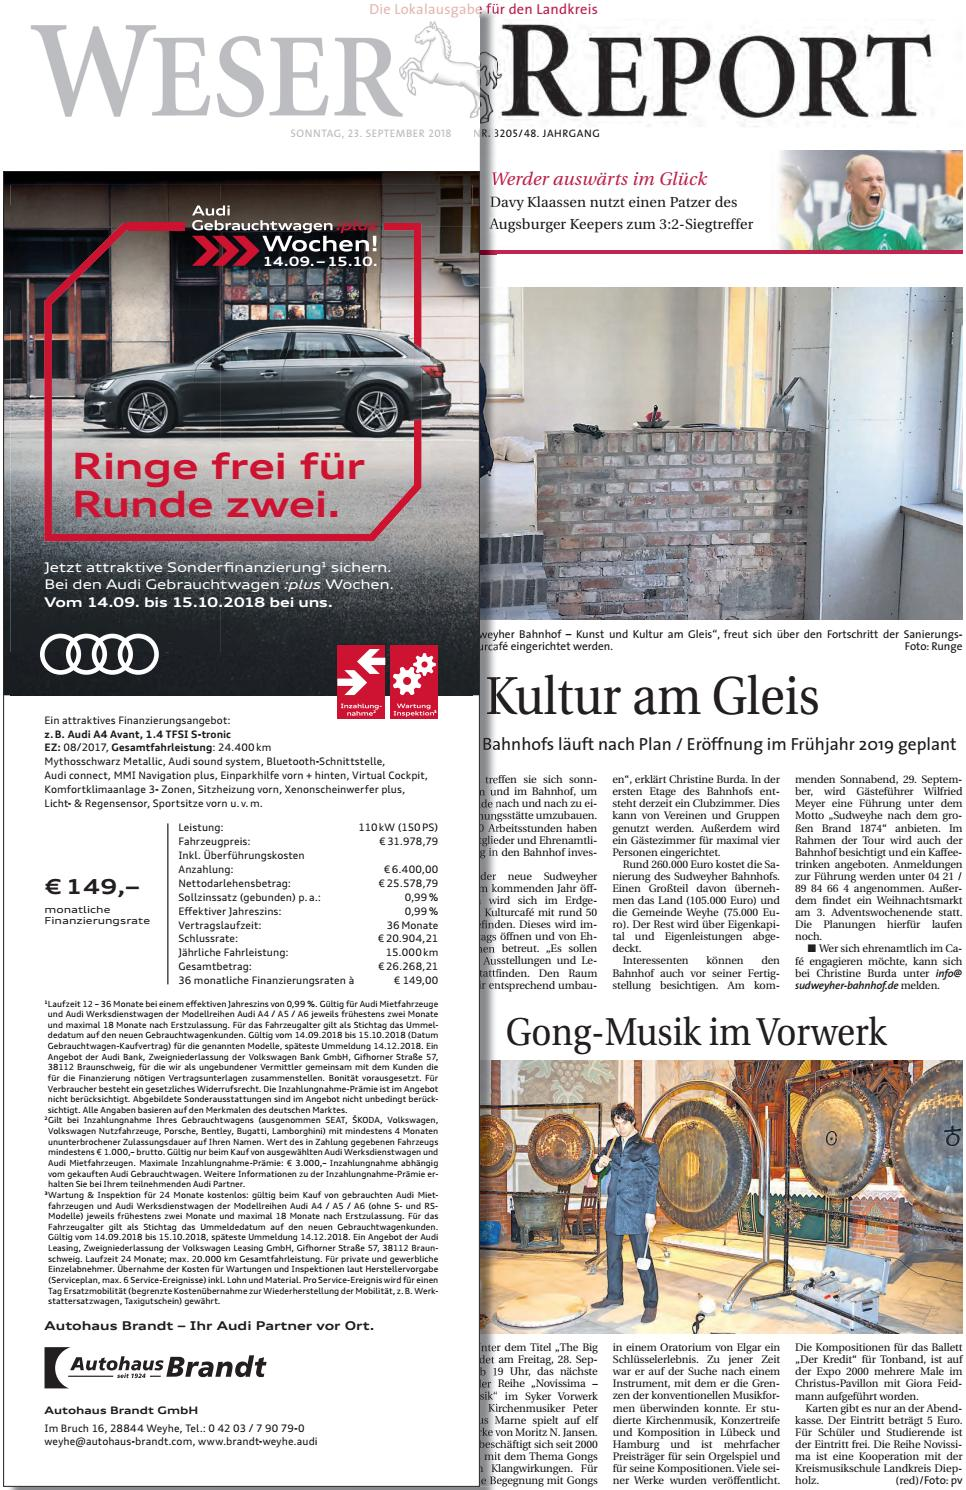 Weser Report Weyhe, Syke, Bassum vom 23.09.2018 by KPS